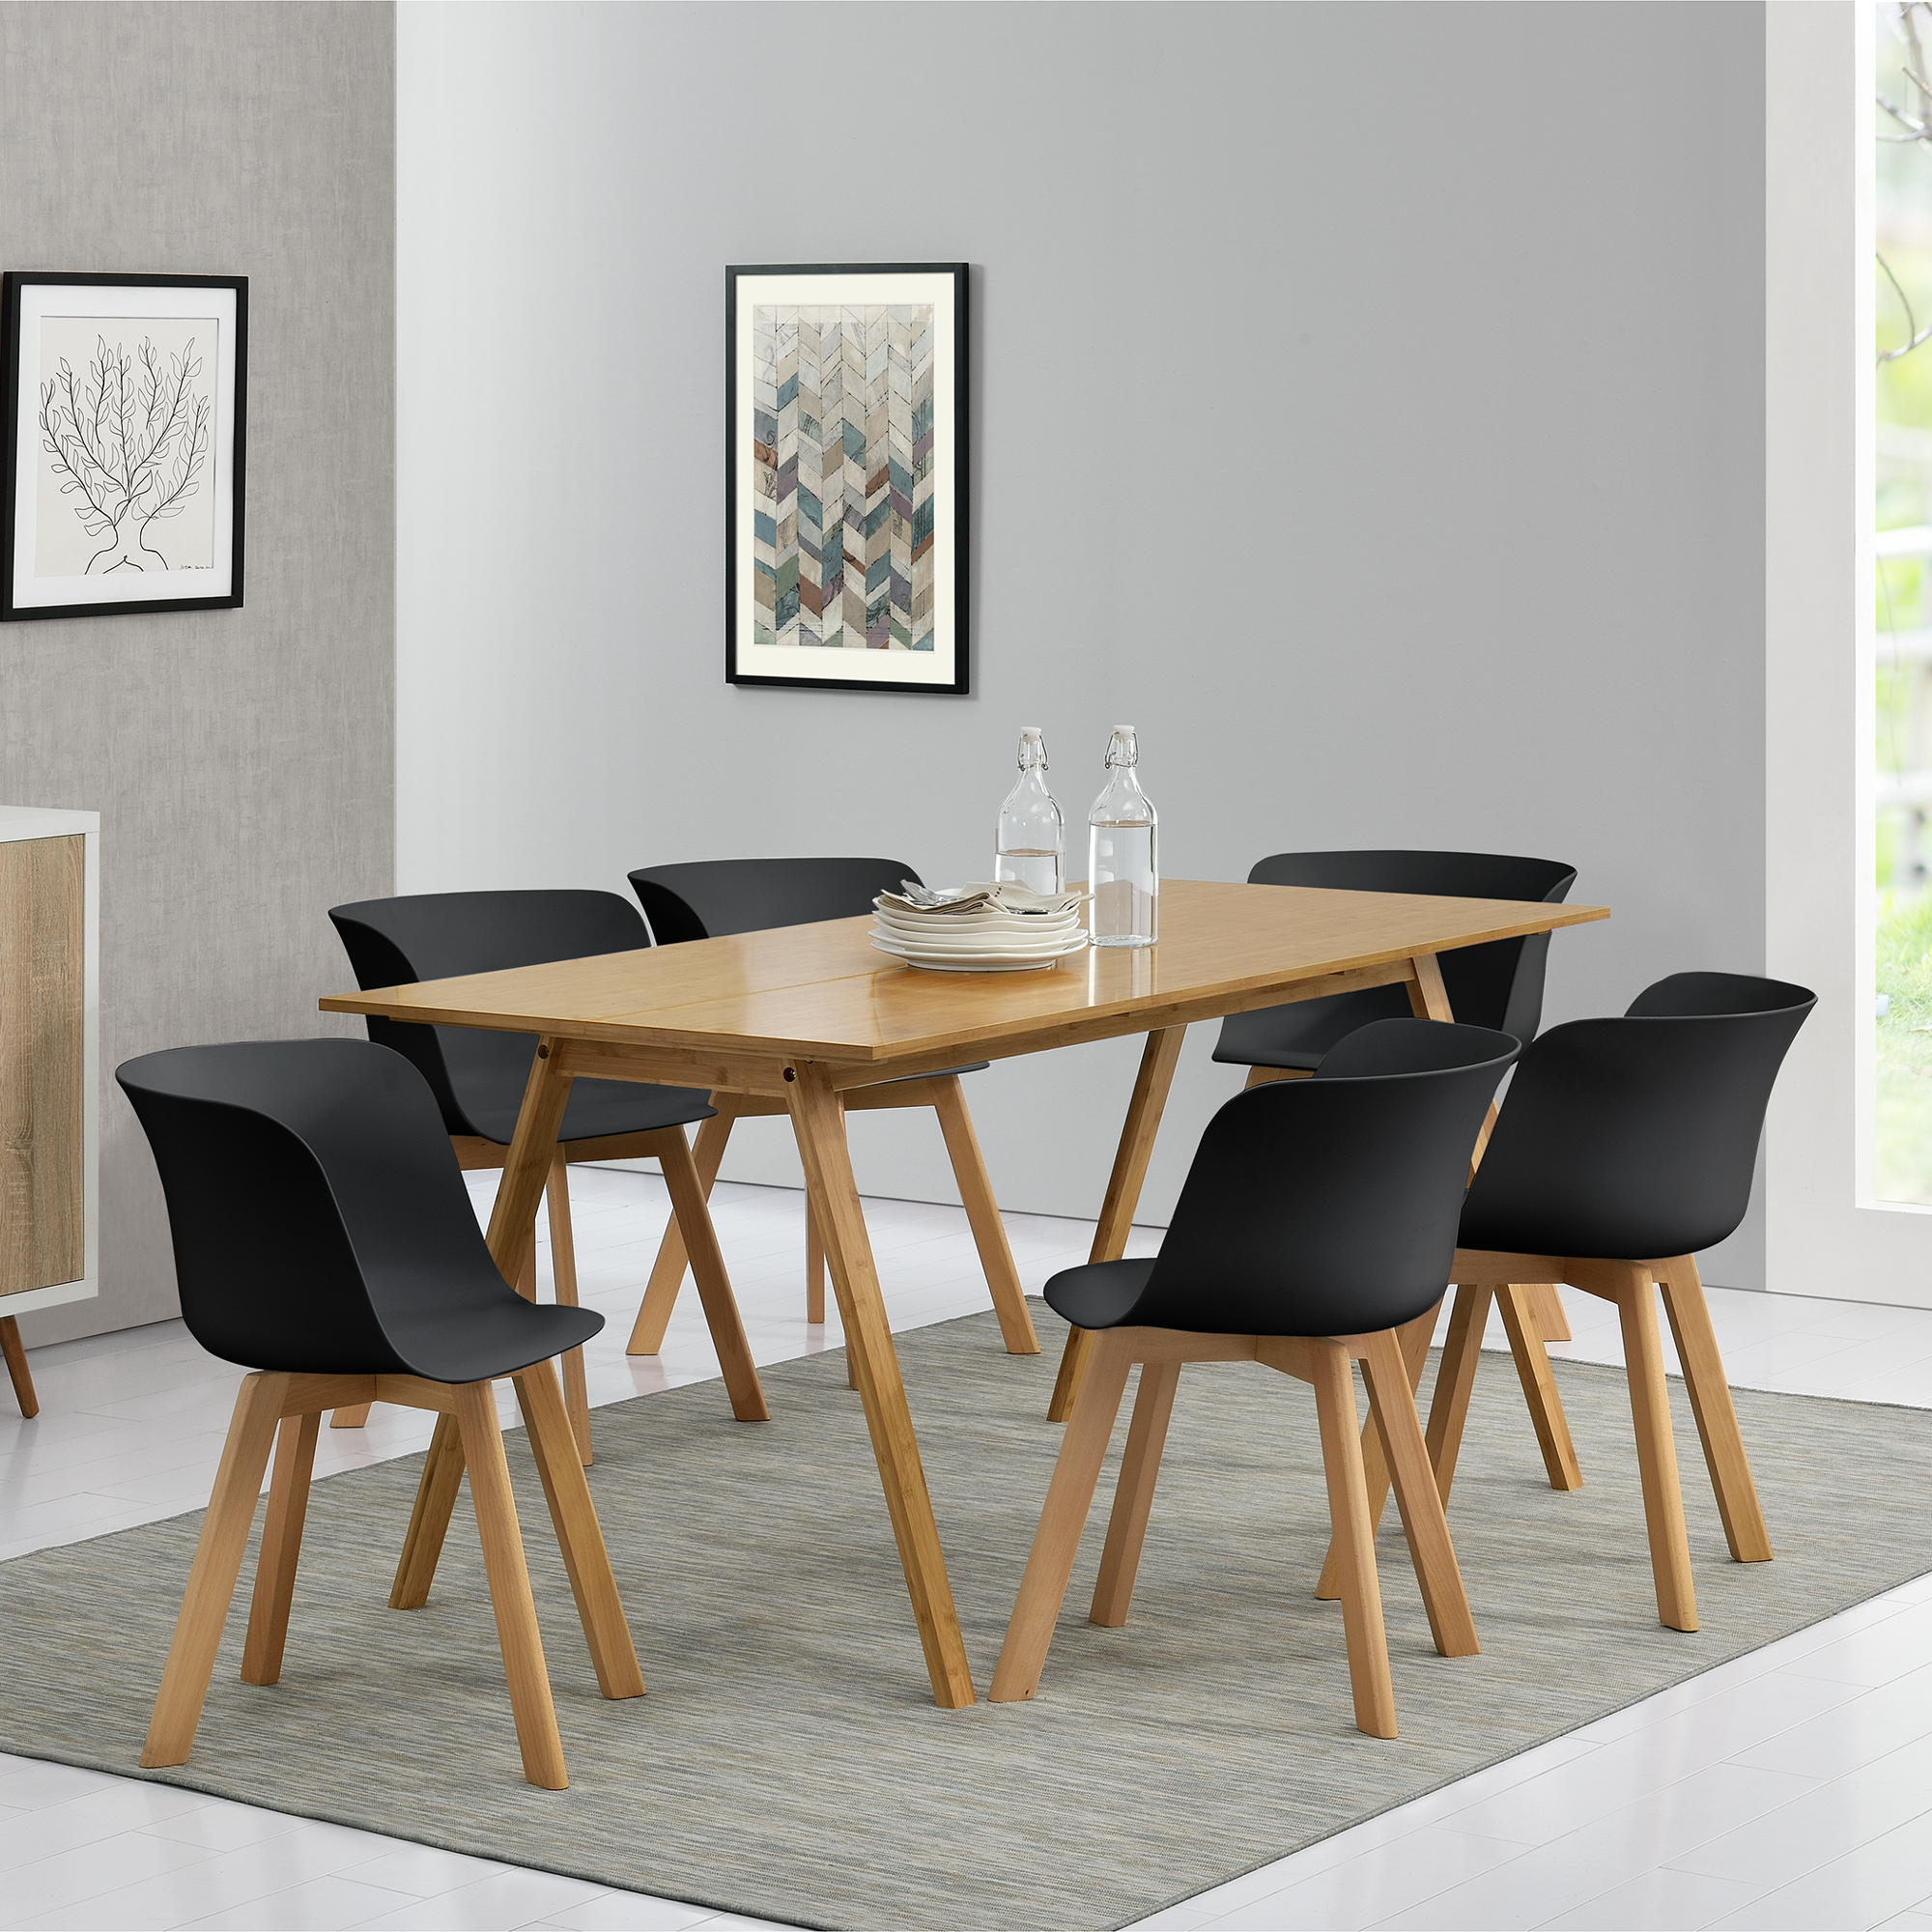 en.casa]® Tavolo da pranzo con 6 sedie bambú/nere 180x80 tavolo ...